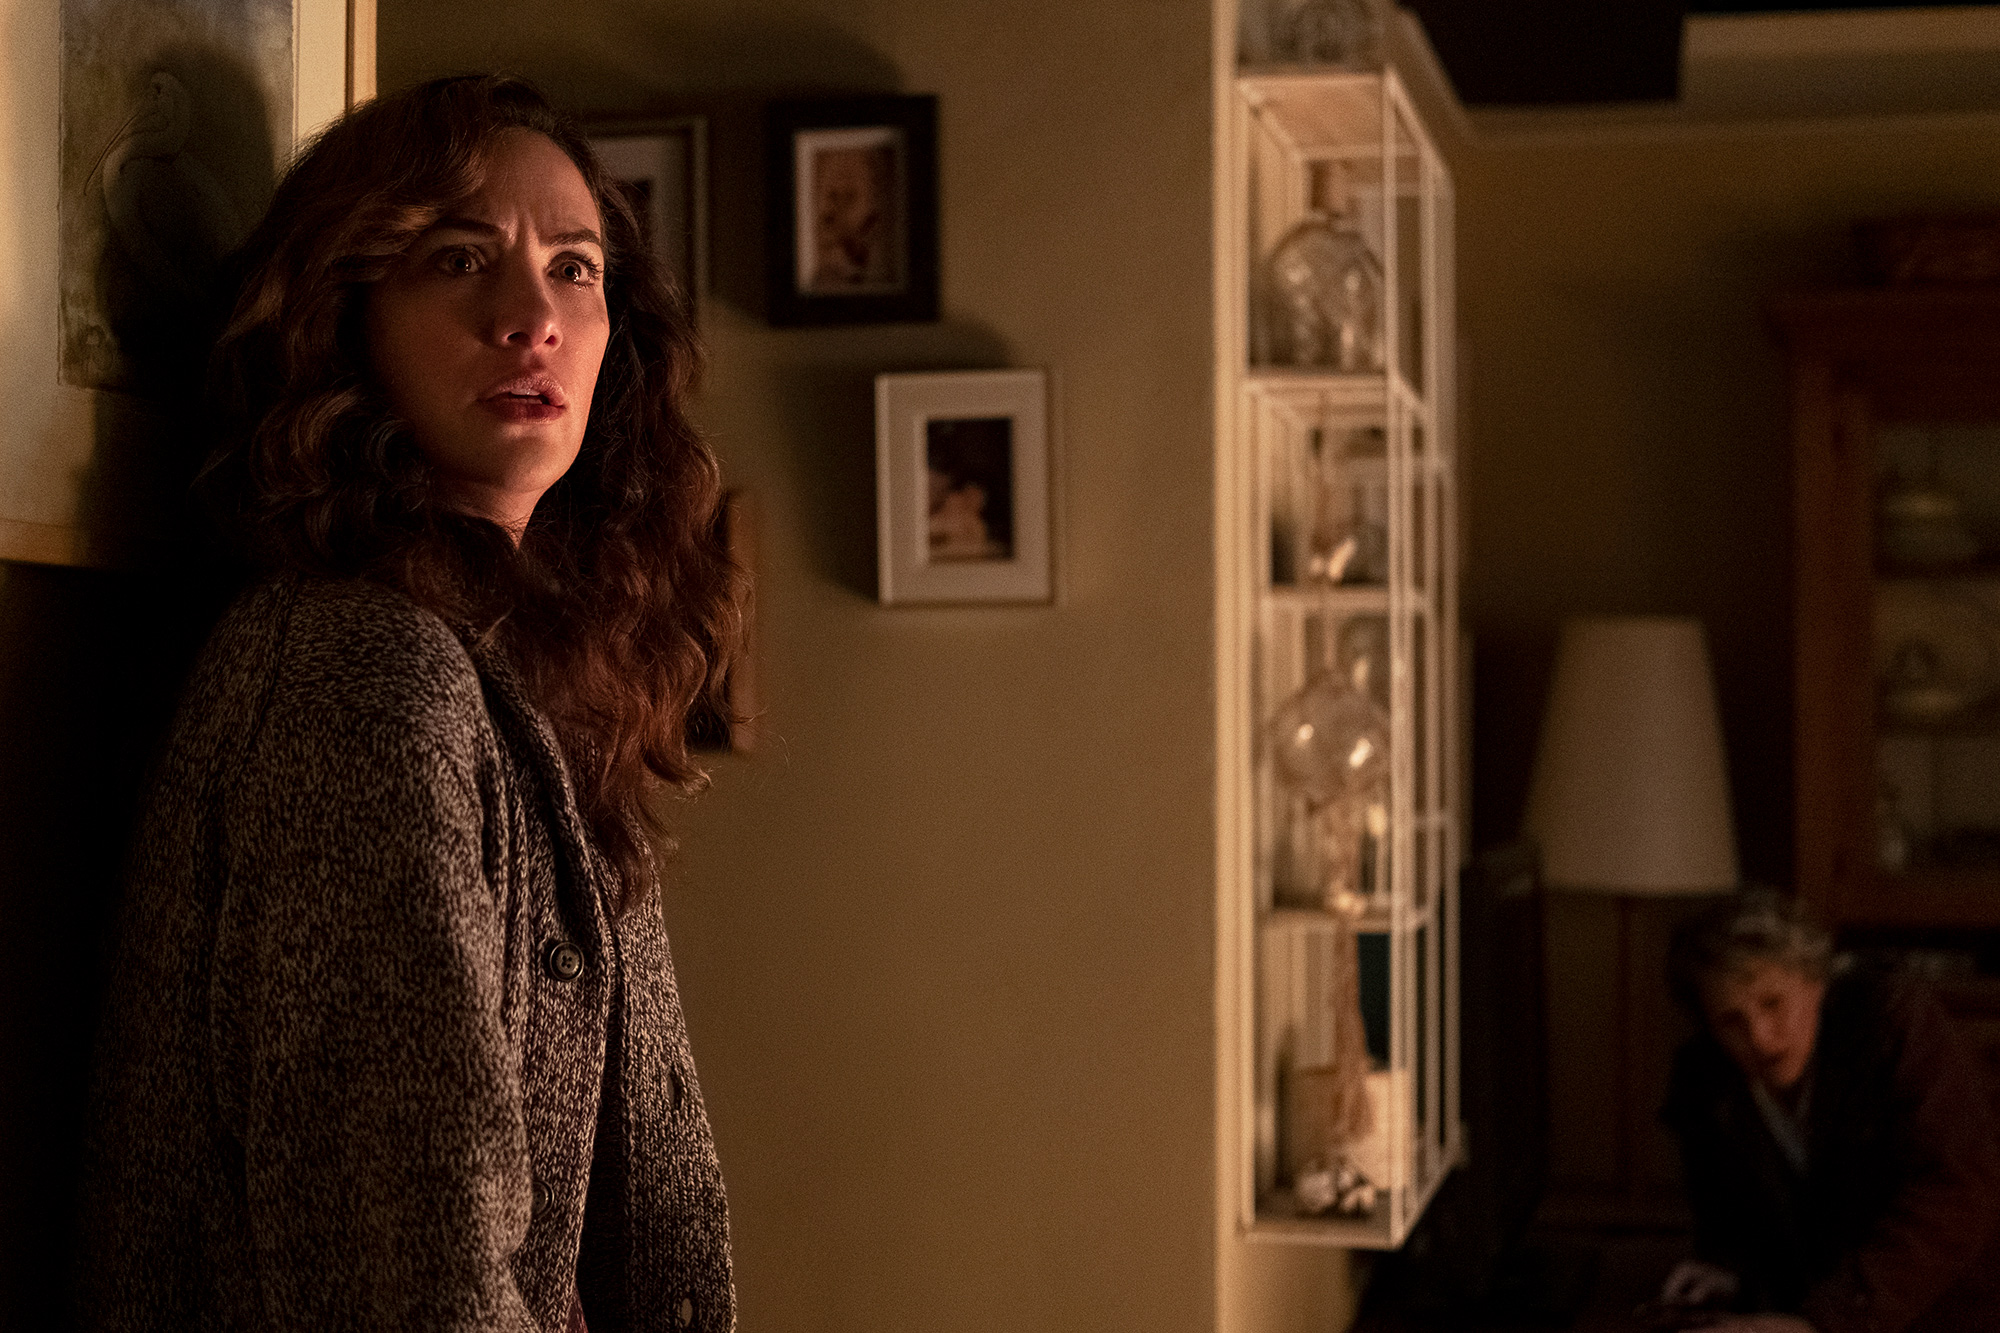 MIDNIGHT MASS (L to R) KATE SIEGEL as ERIN GREENE in episode 107 of MIDNIGHT MASS